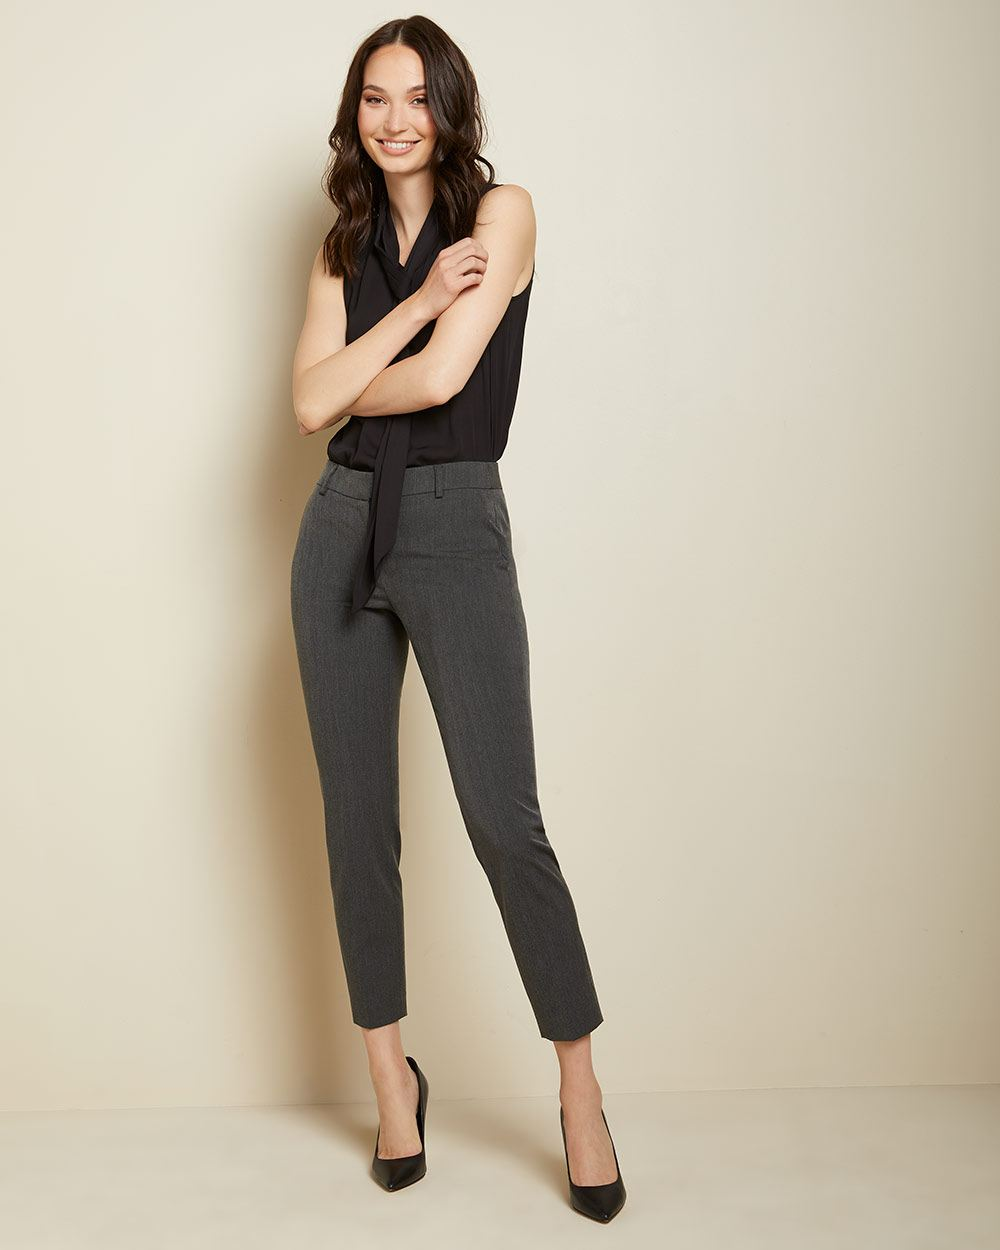 Grey Chevron Curvy Fit Slim Leg Ankle Pant by Rw & Co